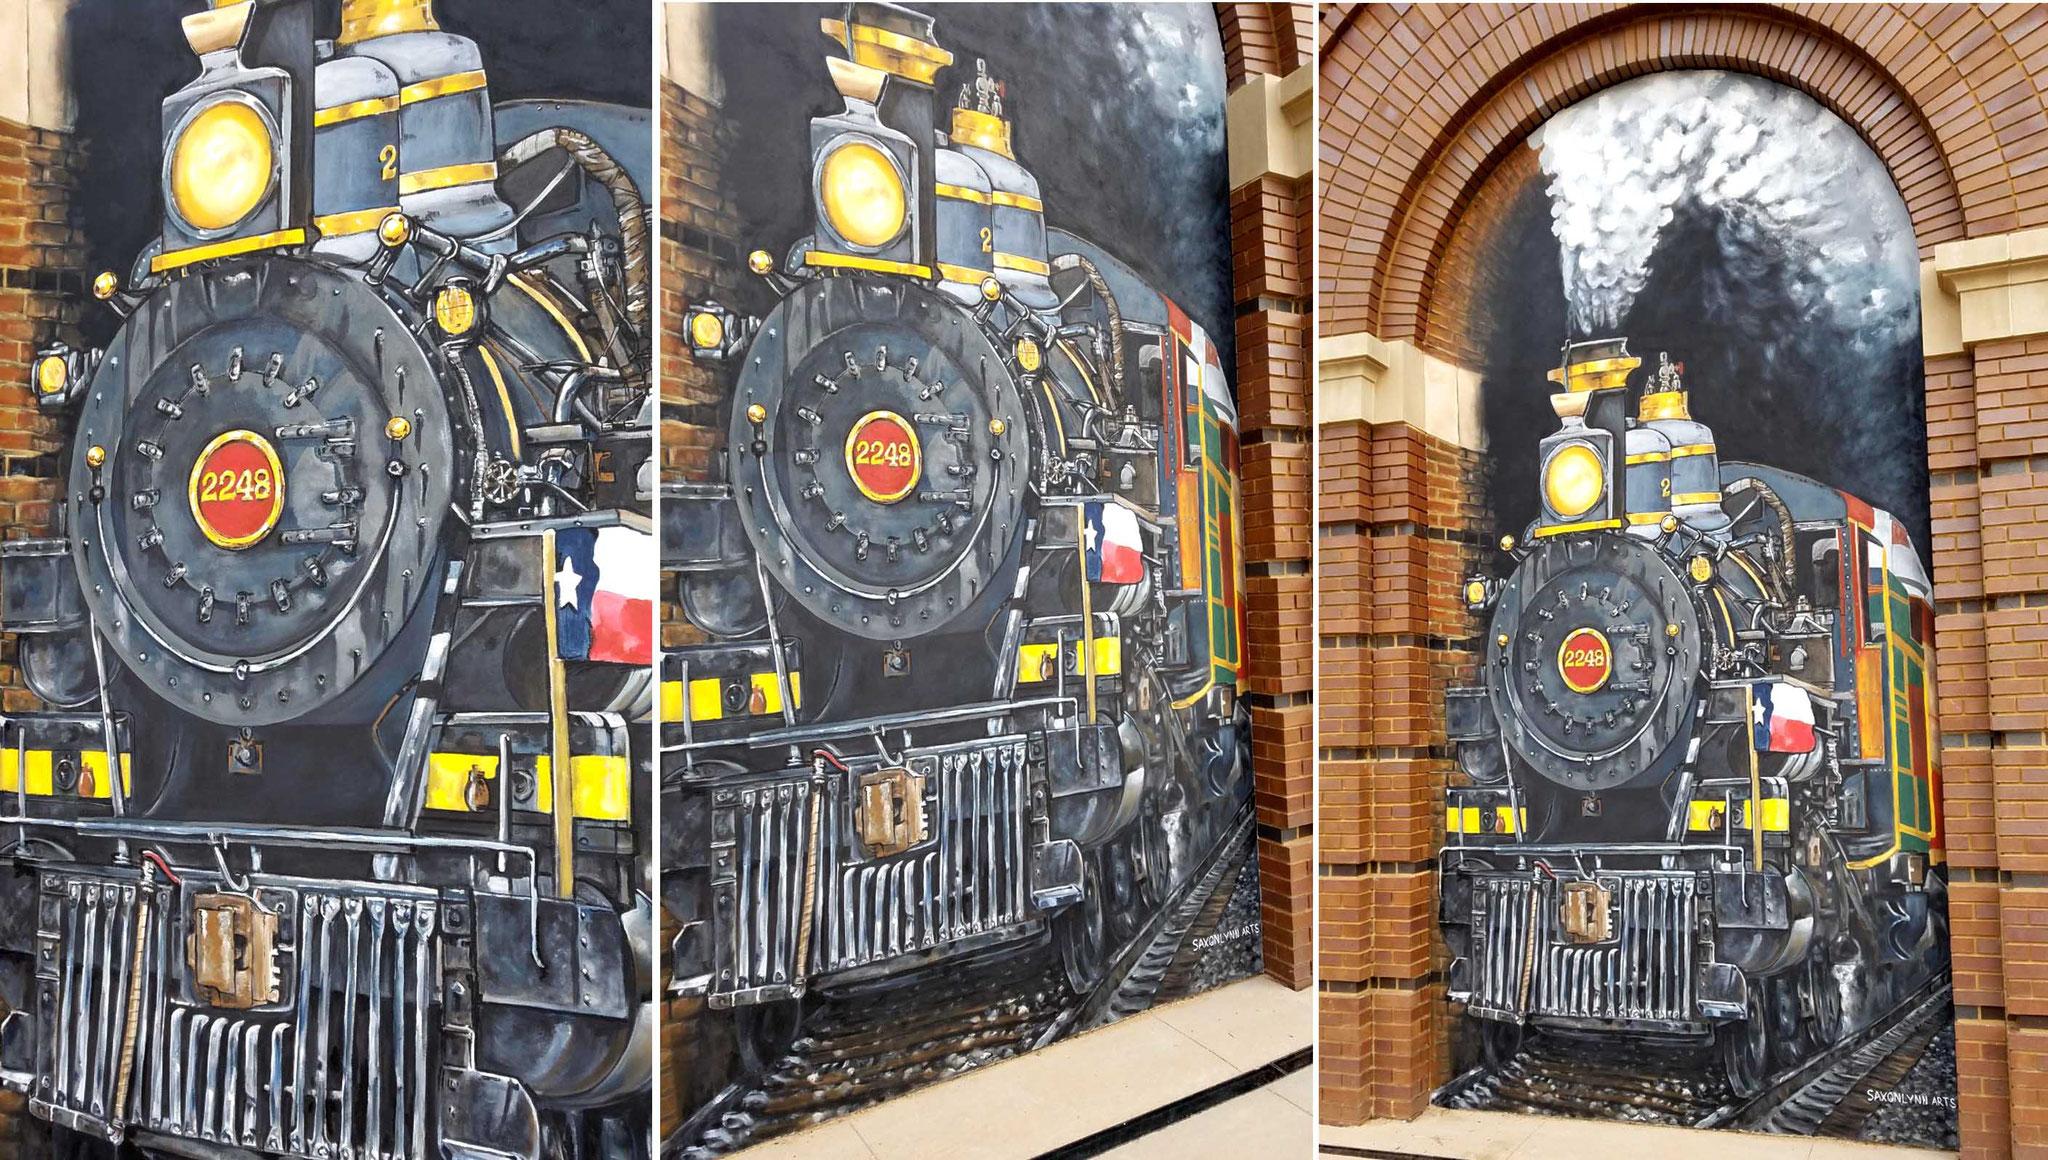 Harvest Hall 3D Locomotive Mural Grapevine Texas